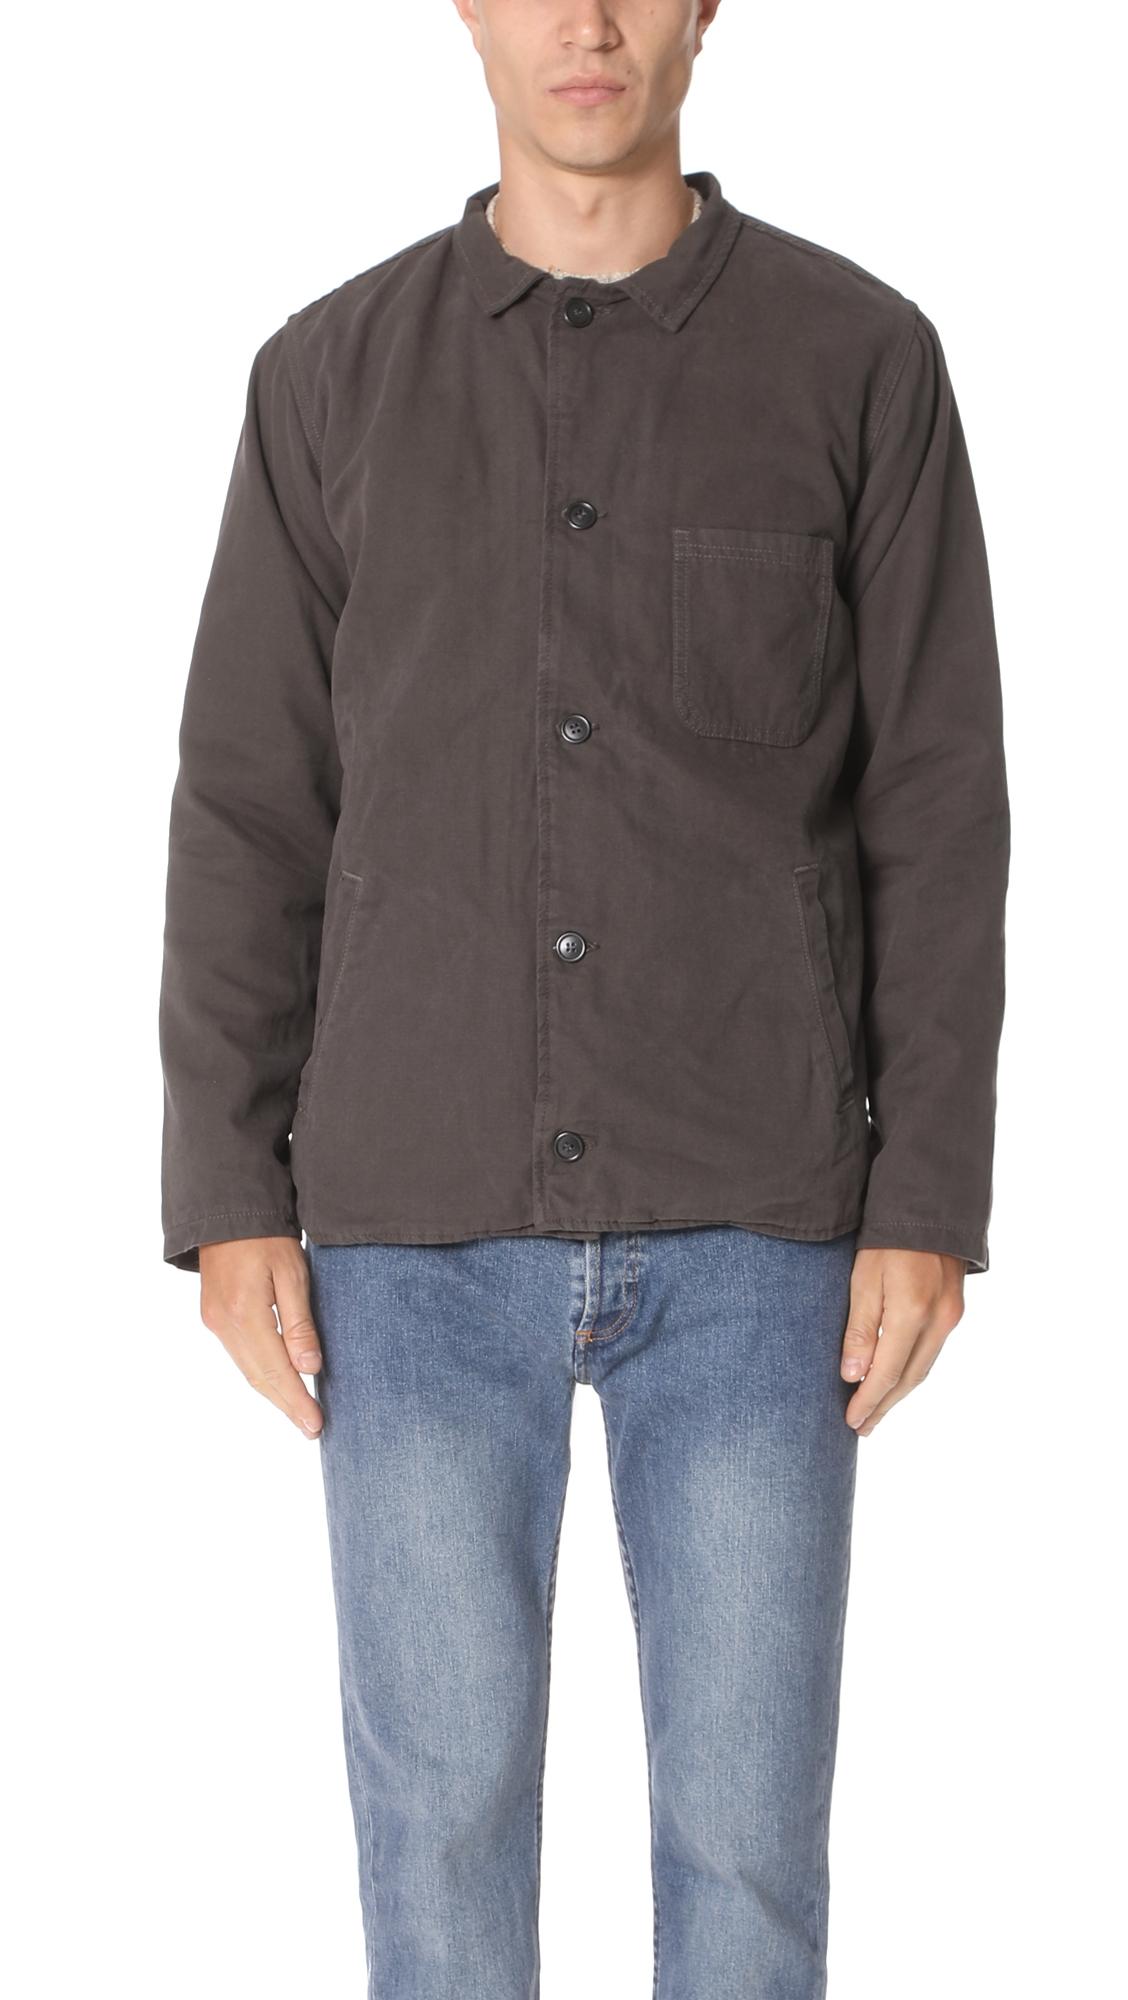 MOLLUSK Fall Deck Jacket in Faded Black